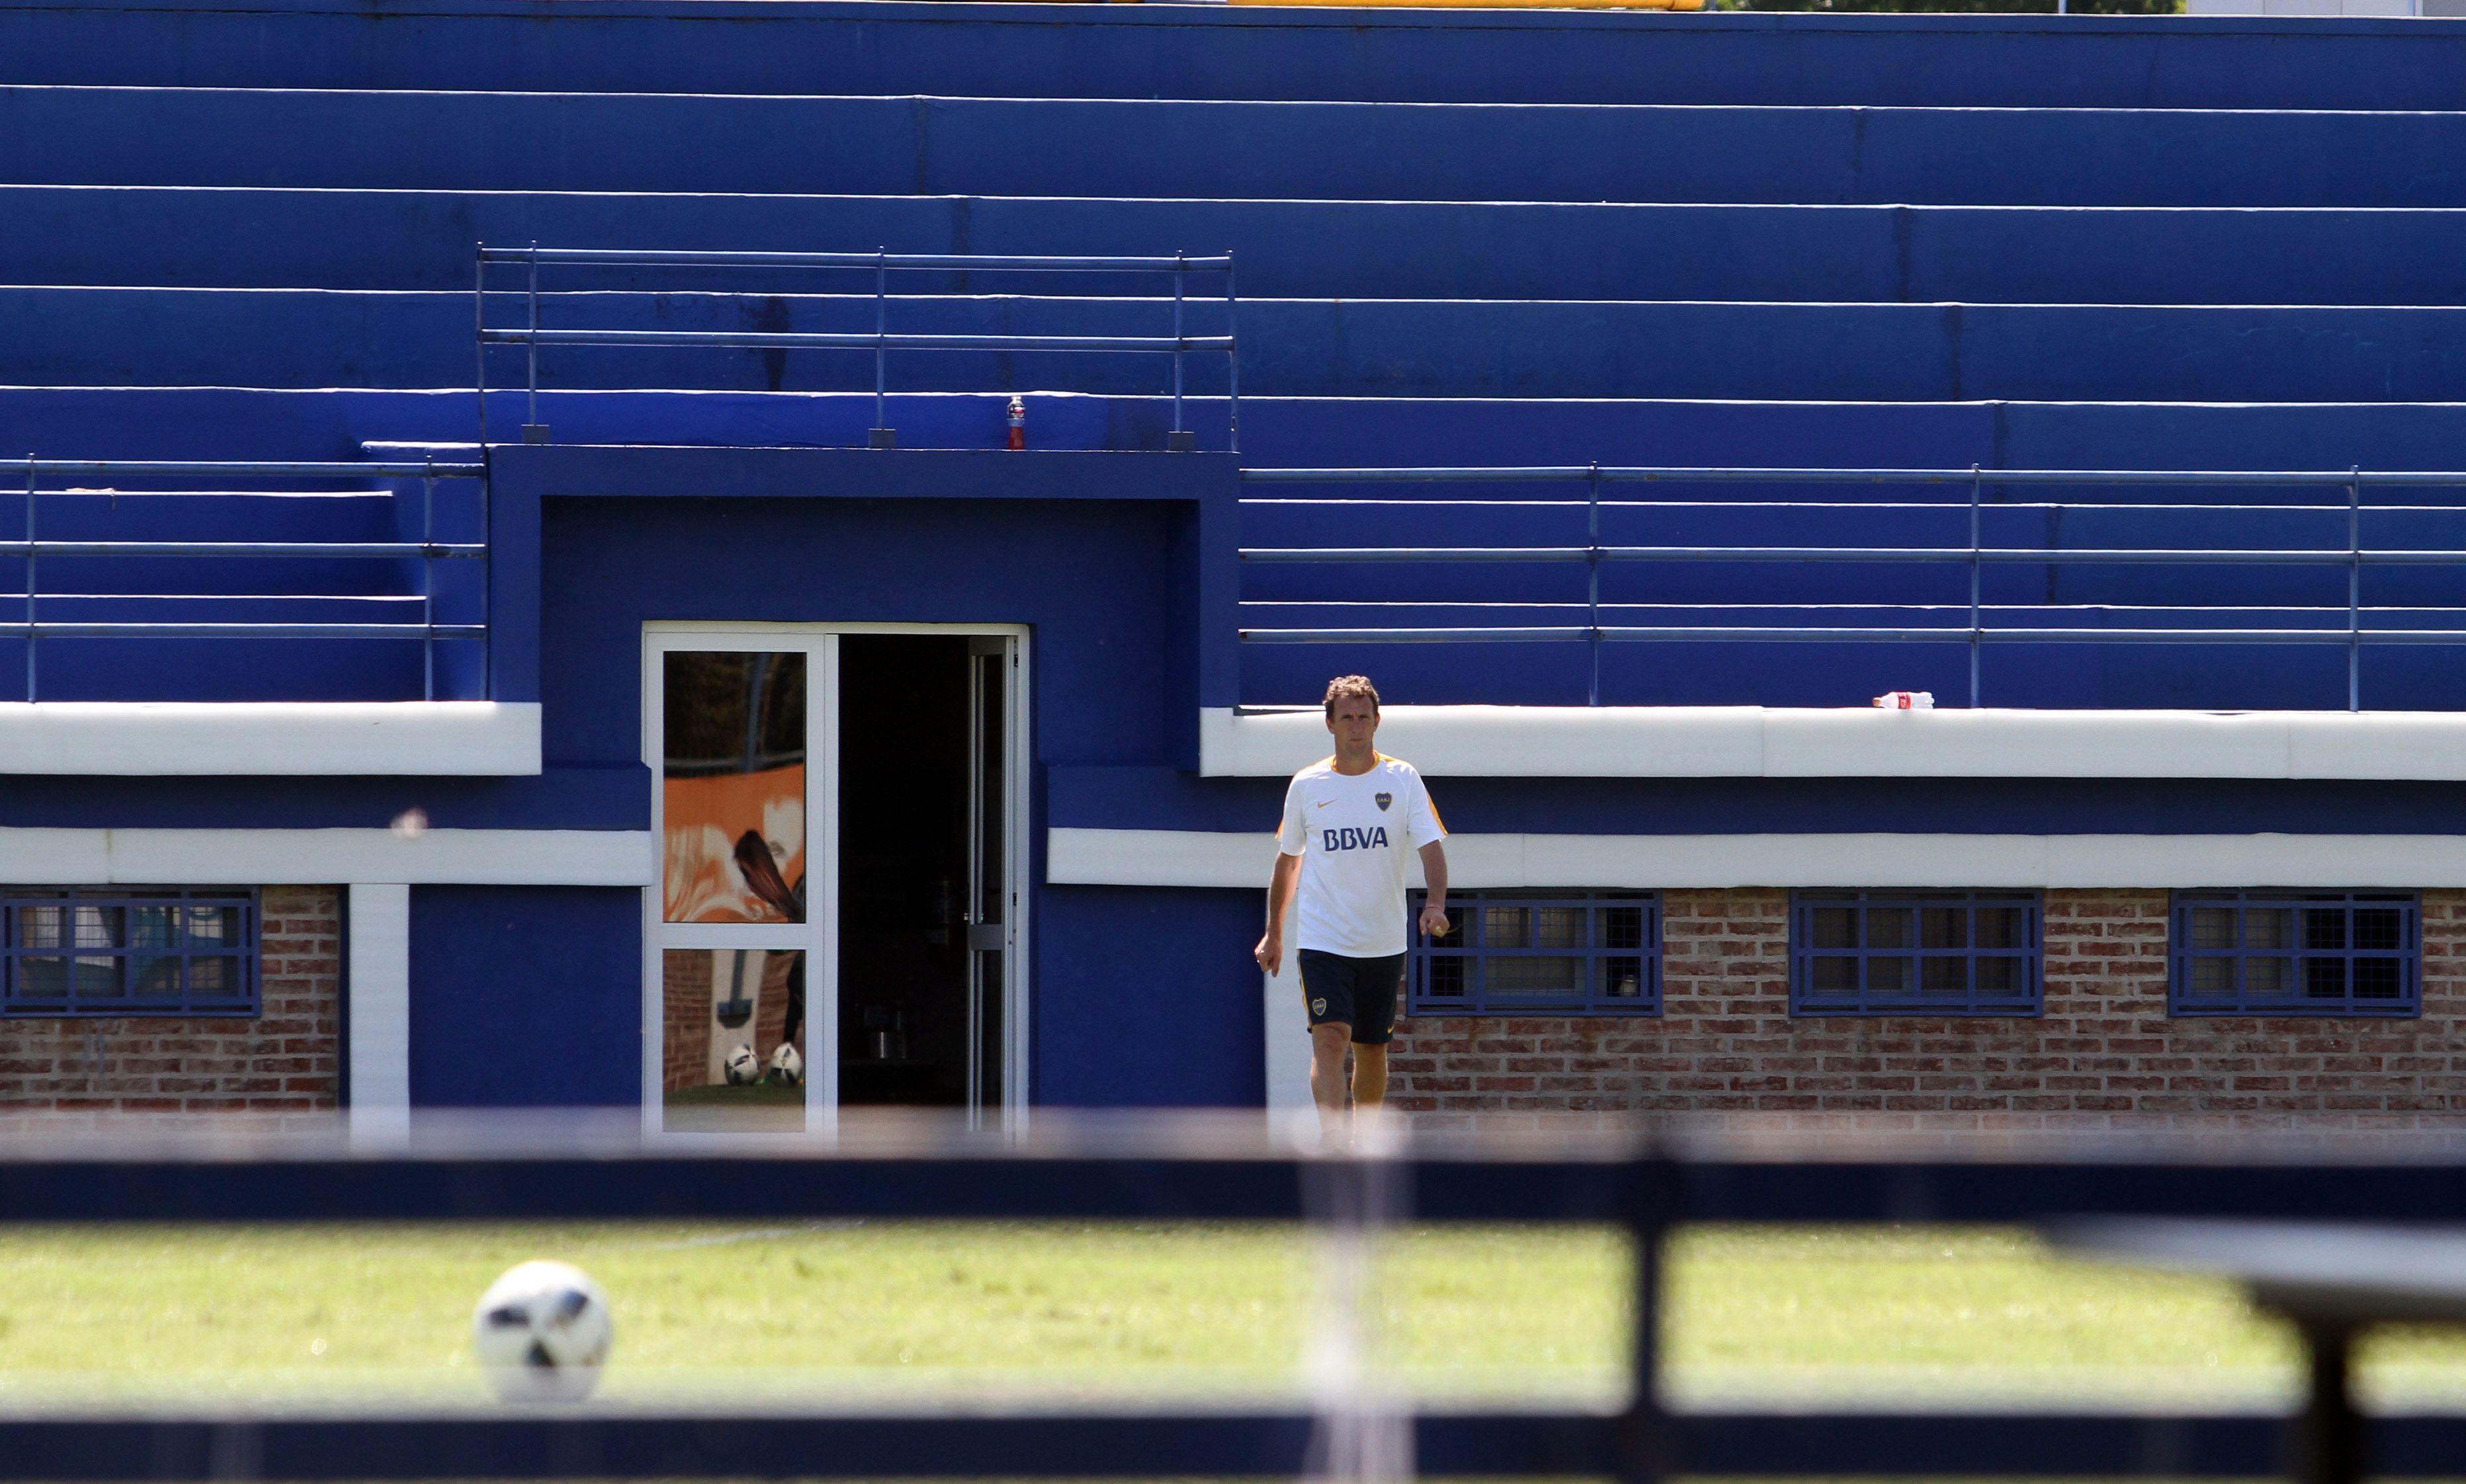 Rodolfo Arruabarrena dirigió la práctica de Boca: ¿Se queda?